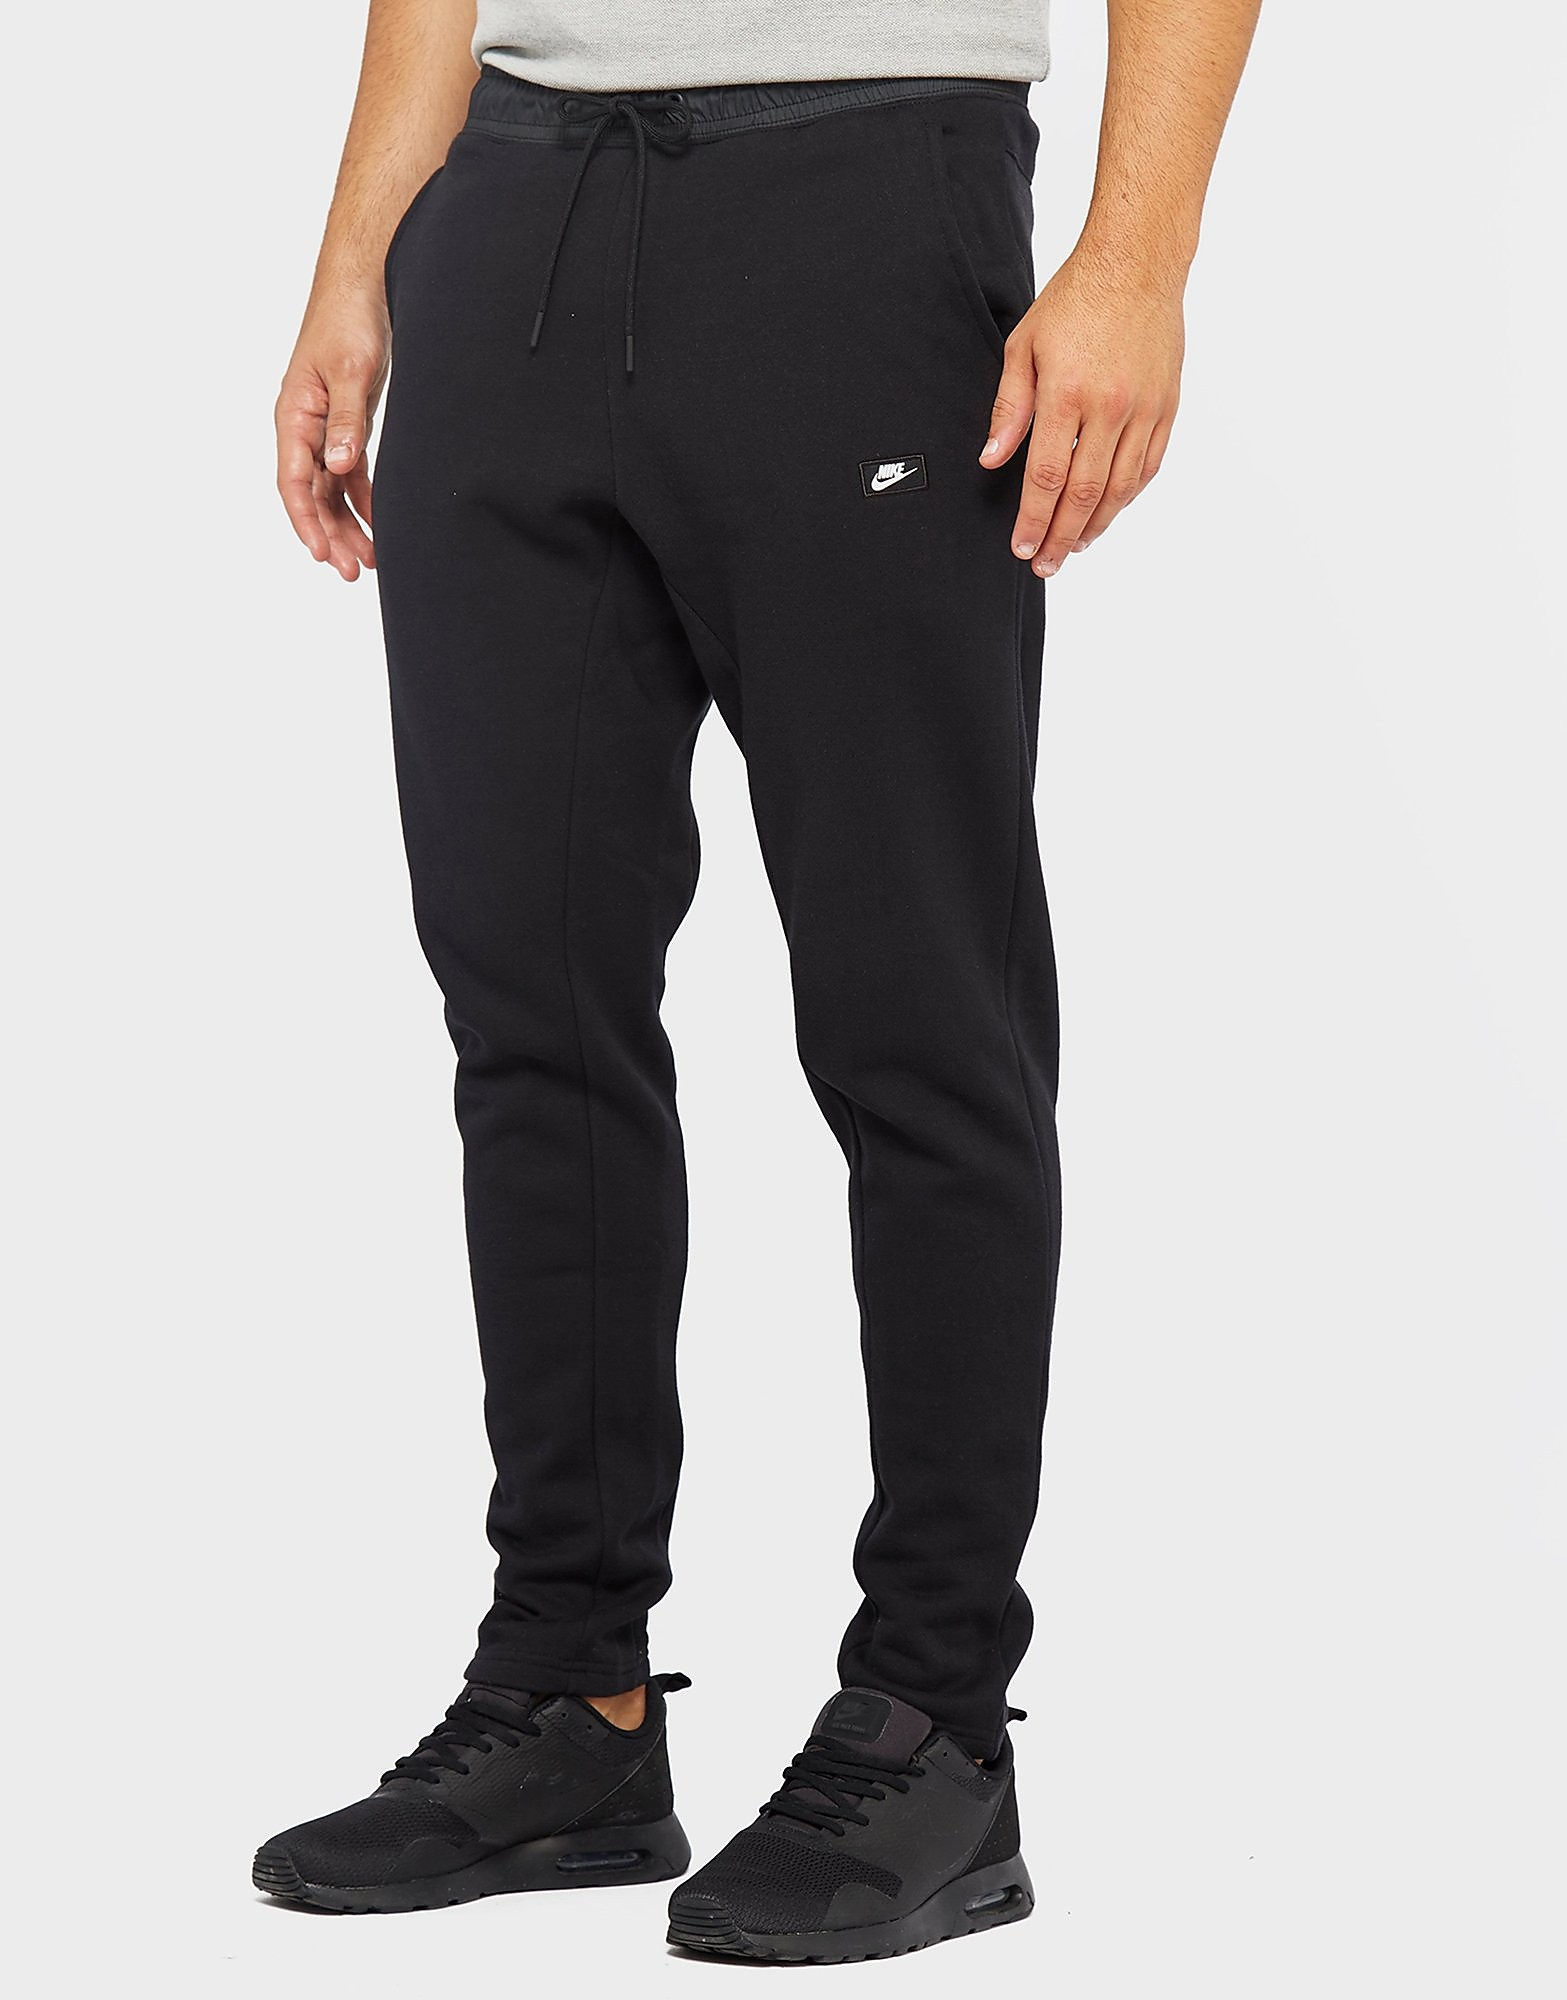 Nike Ess Slim Cuff Pant